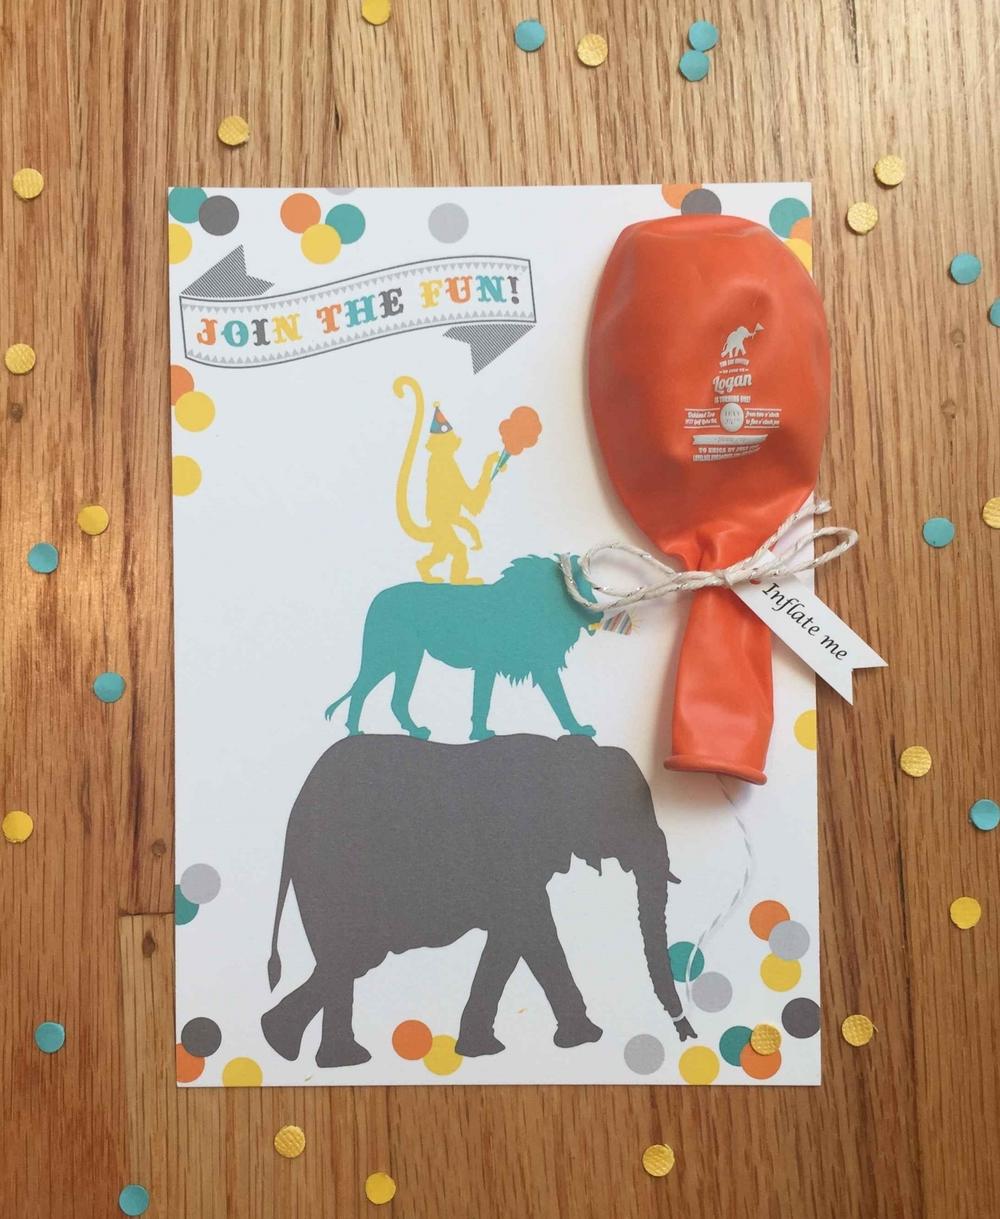 "img src=""httpwww.theparkwayevents.jpg"" alt=""San Francisco Bay Area Kids Balloon Birthday Party Invitation Event Planner"".jpg"